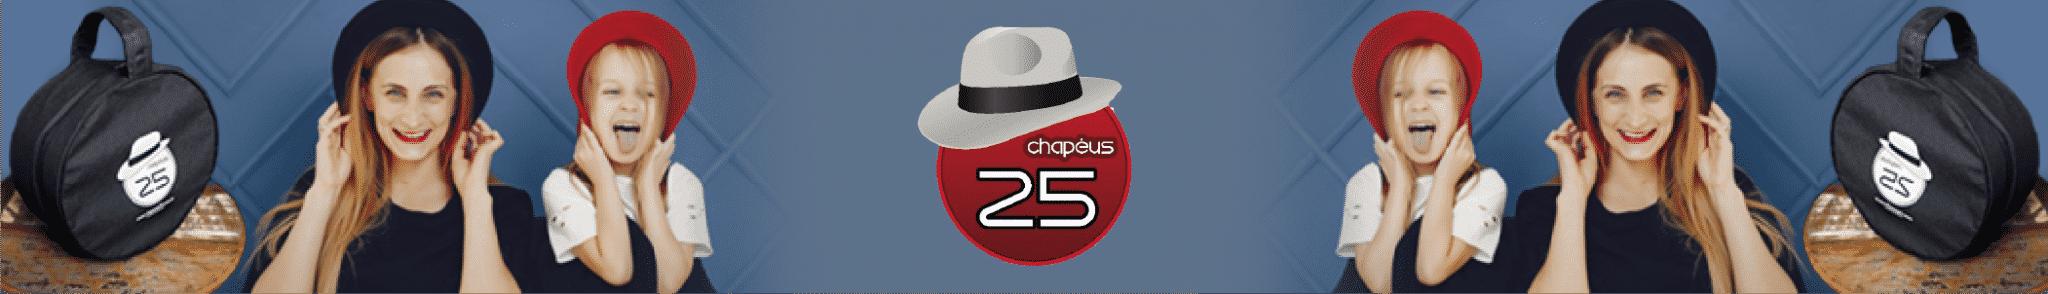 chapeus 25 capa